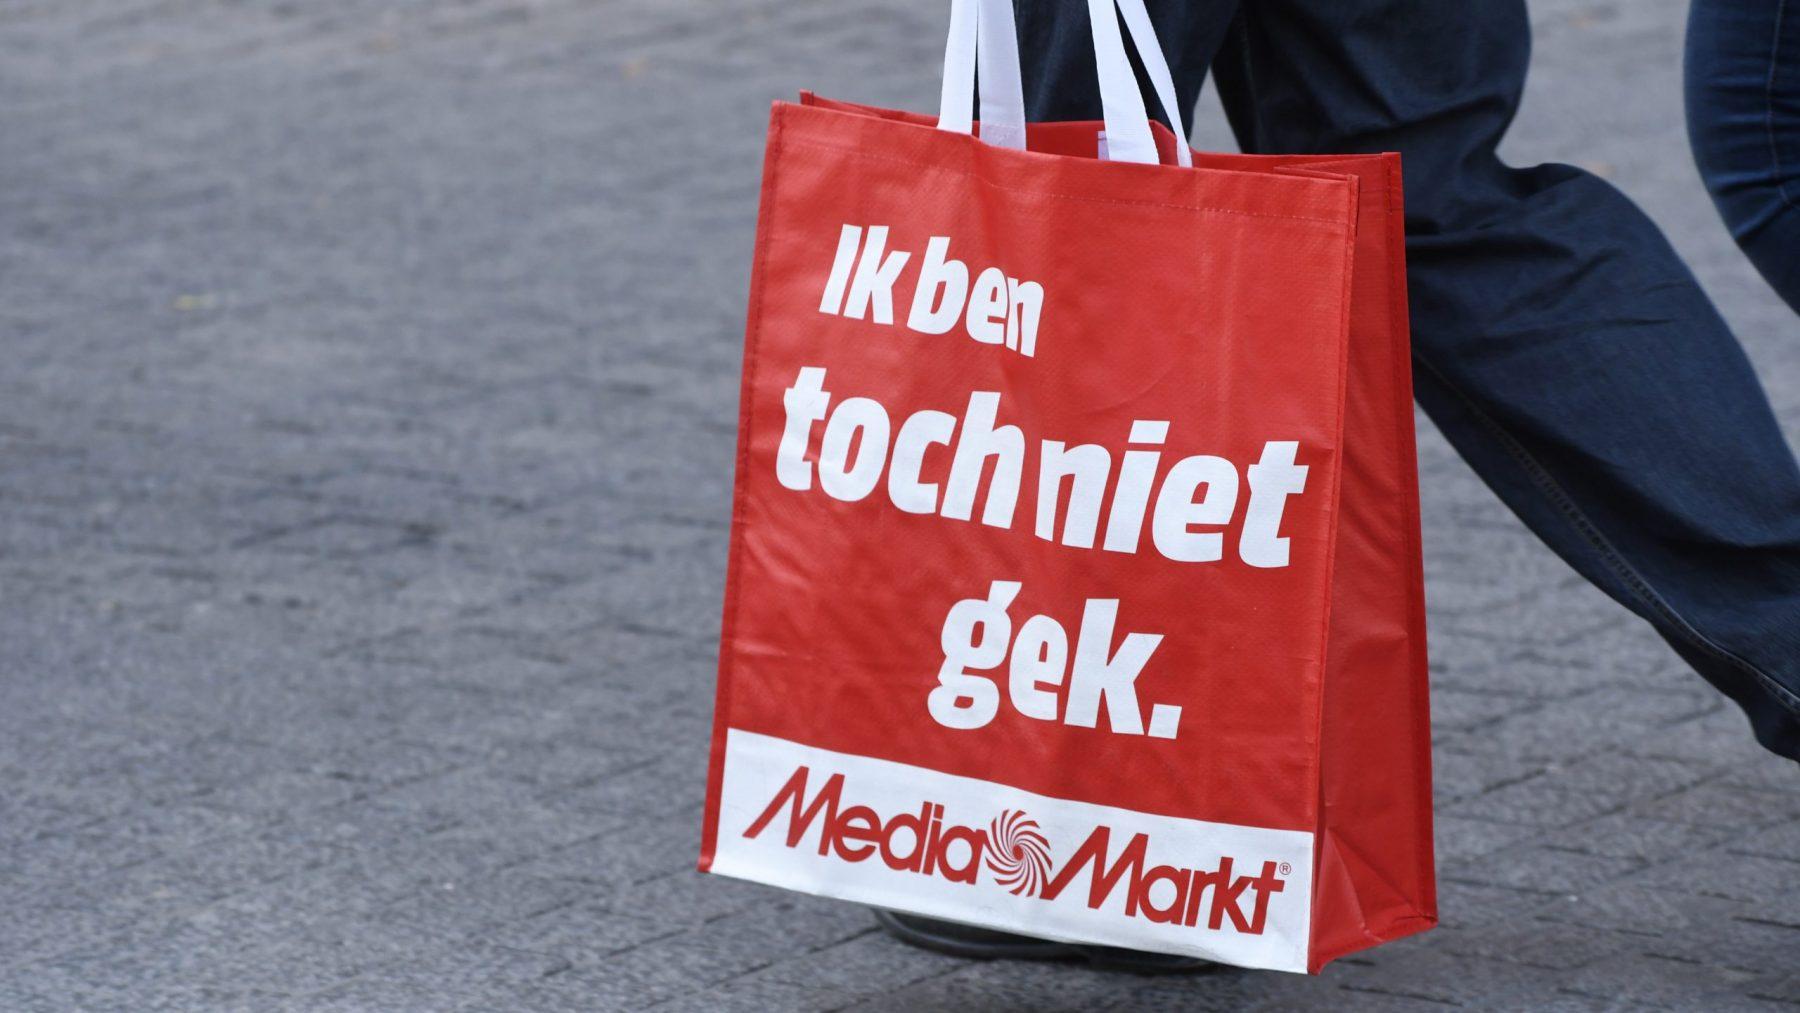 iMac MediaMarkt